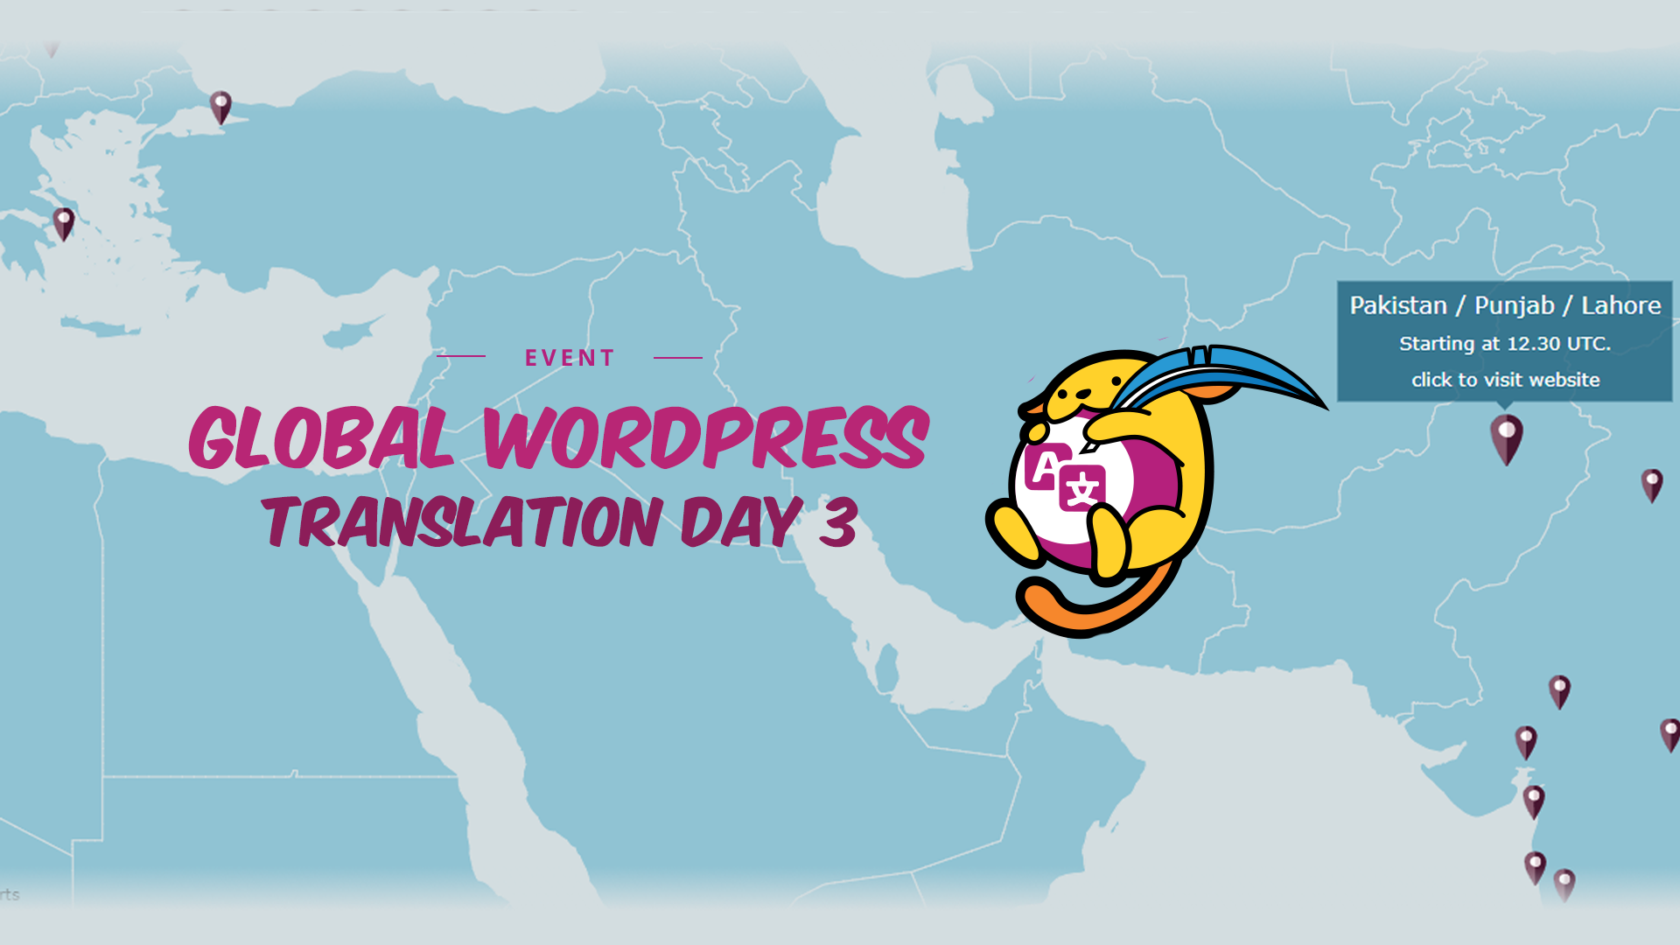 [EVENT SUMMARY]: Global WordPress Translation Day 3